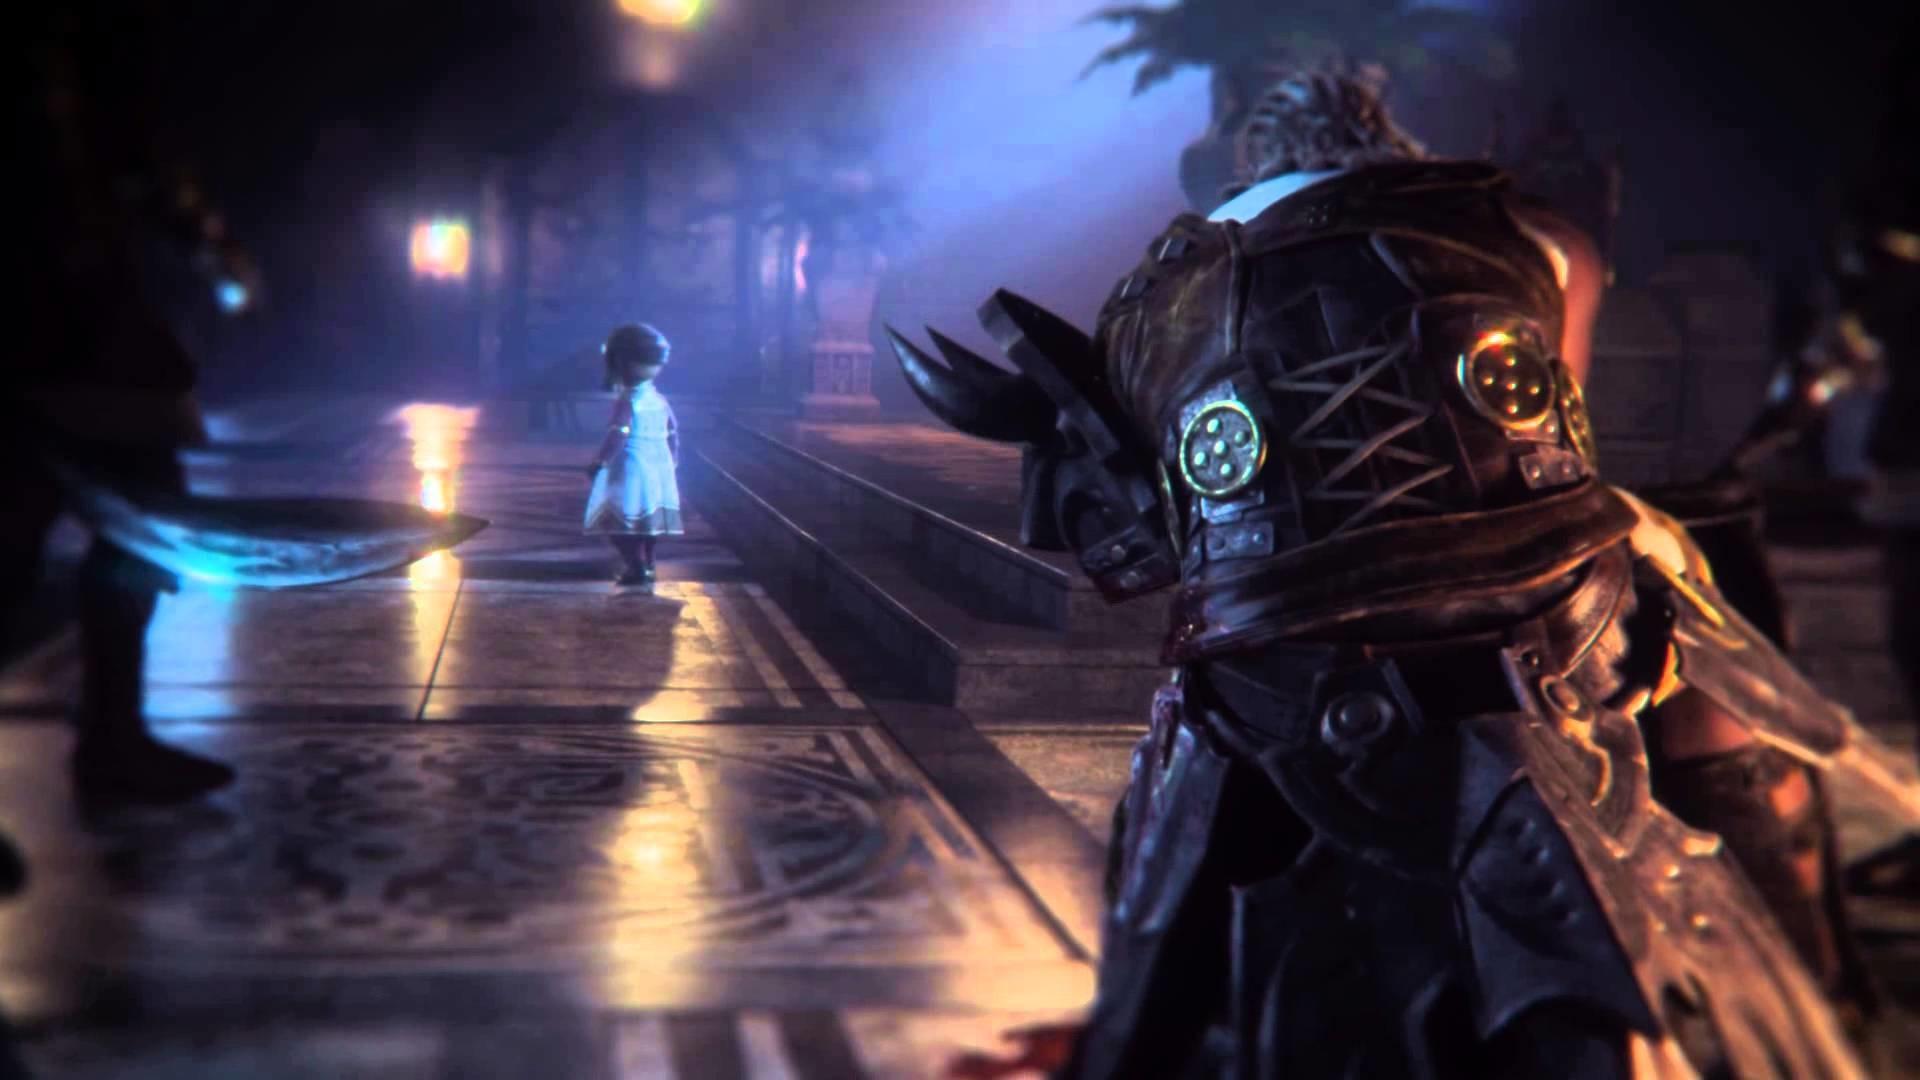 Final Fantasy XIV: Heavensward – Opening cinematic movie